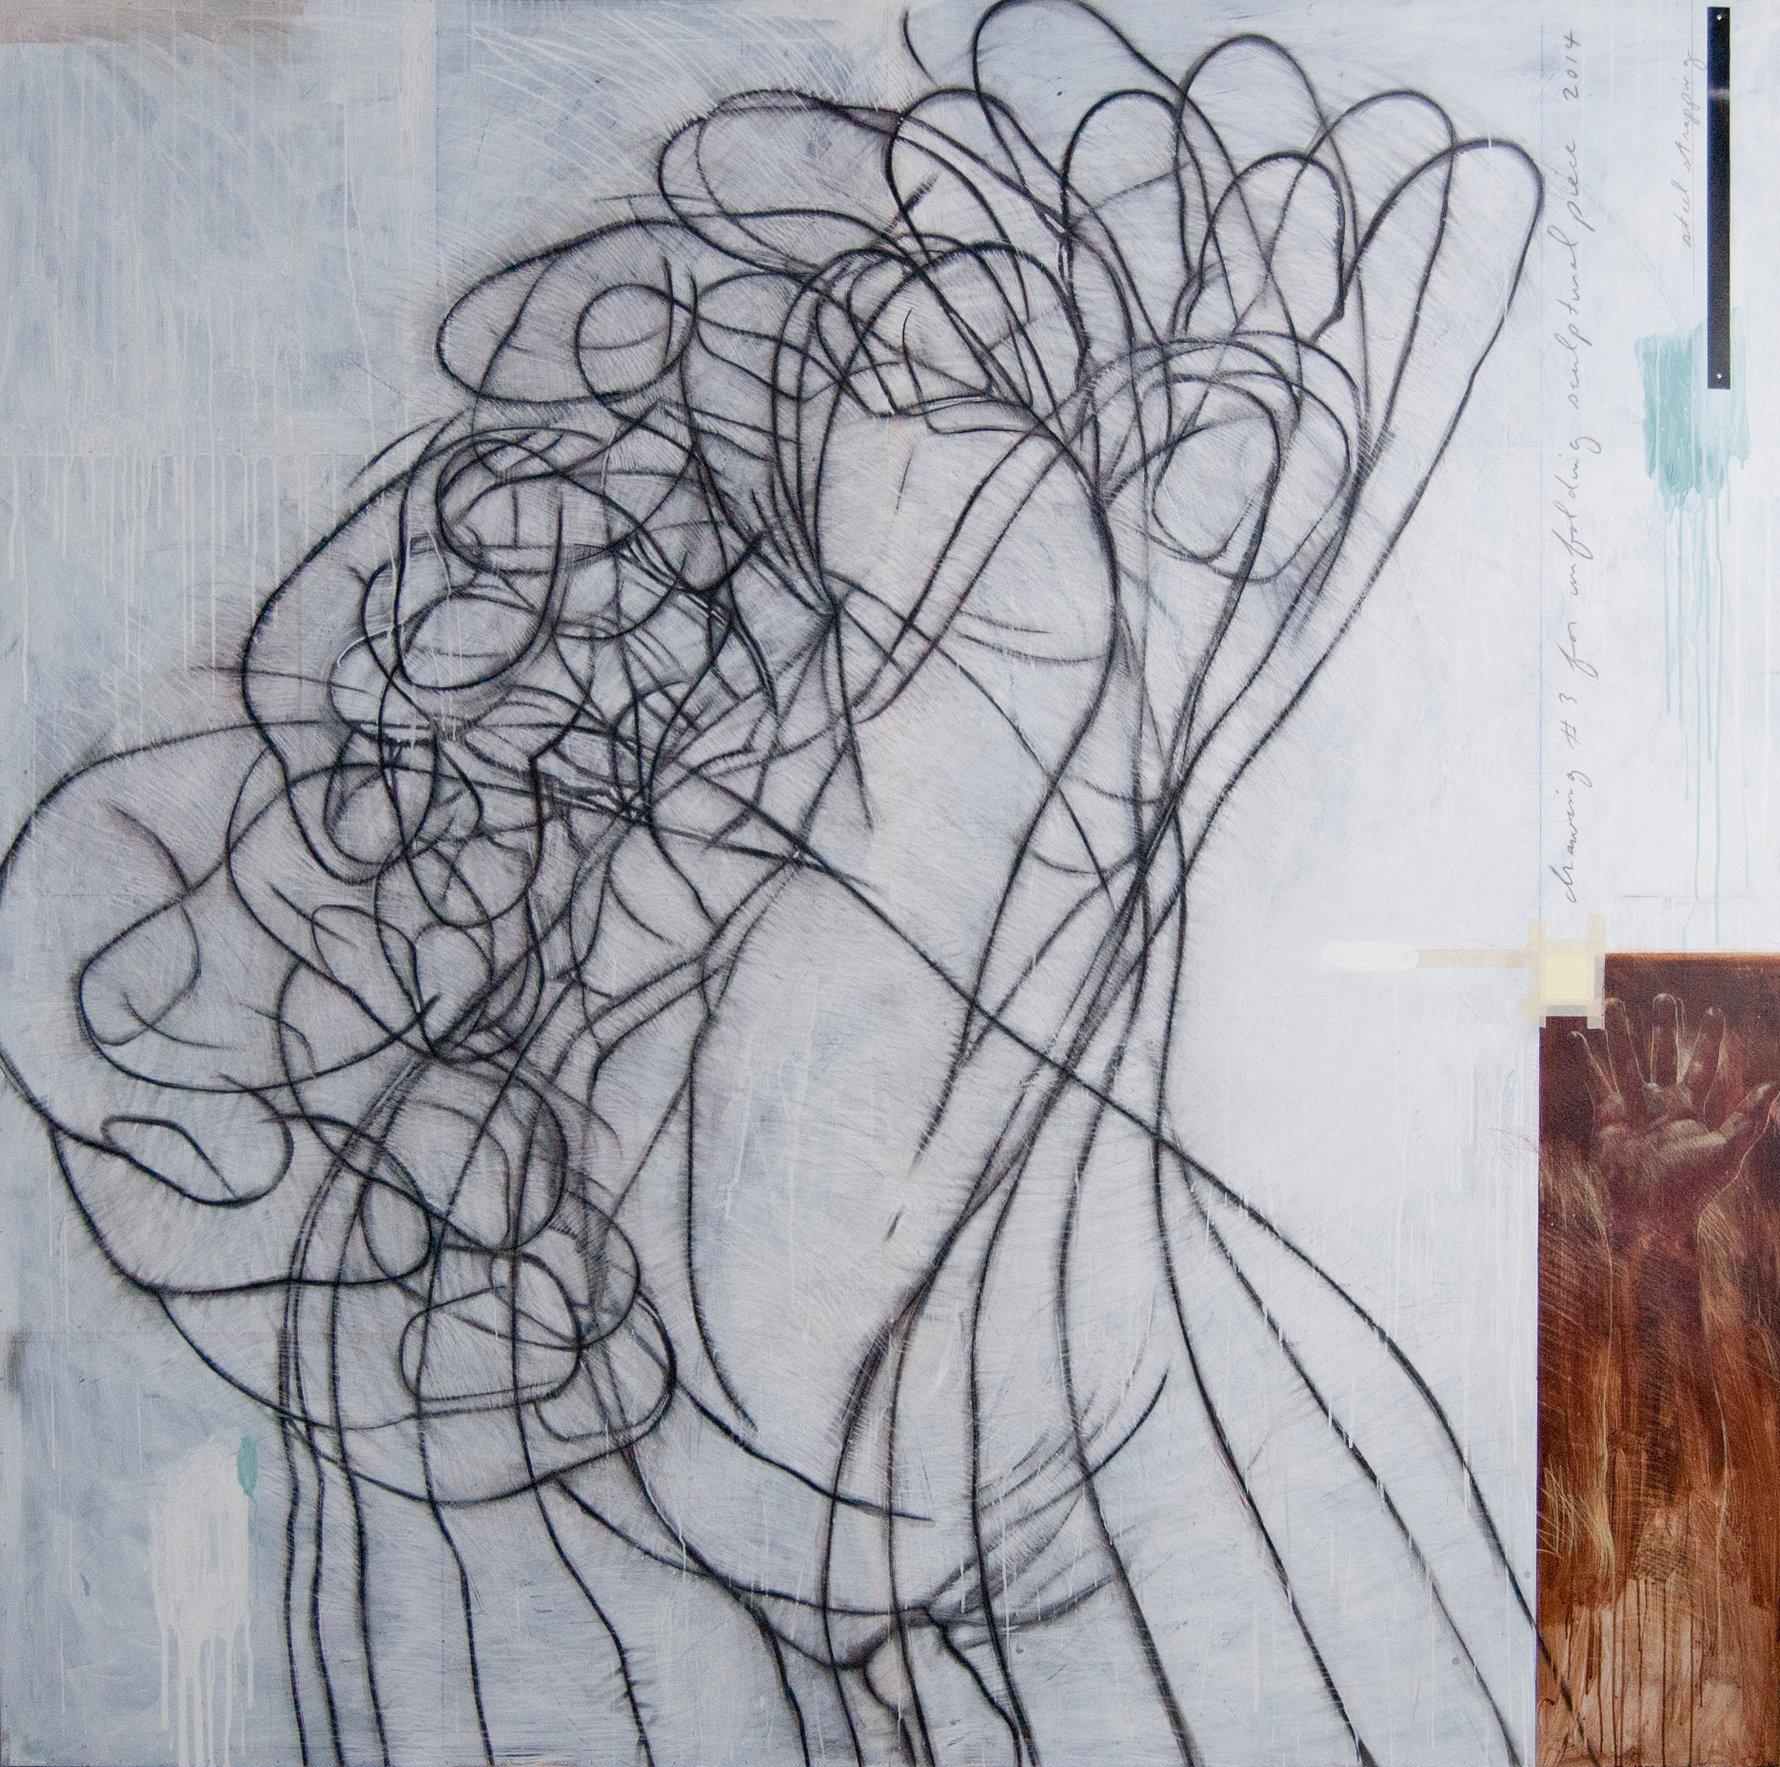 Drawing #3 - 8' x 8'.tif